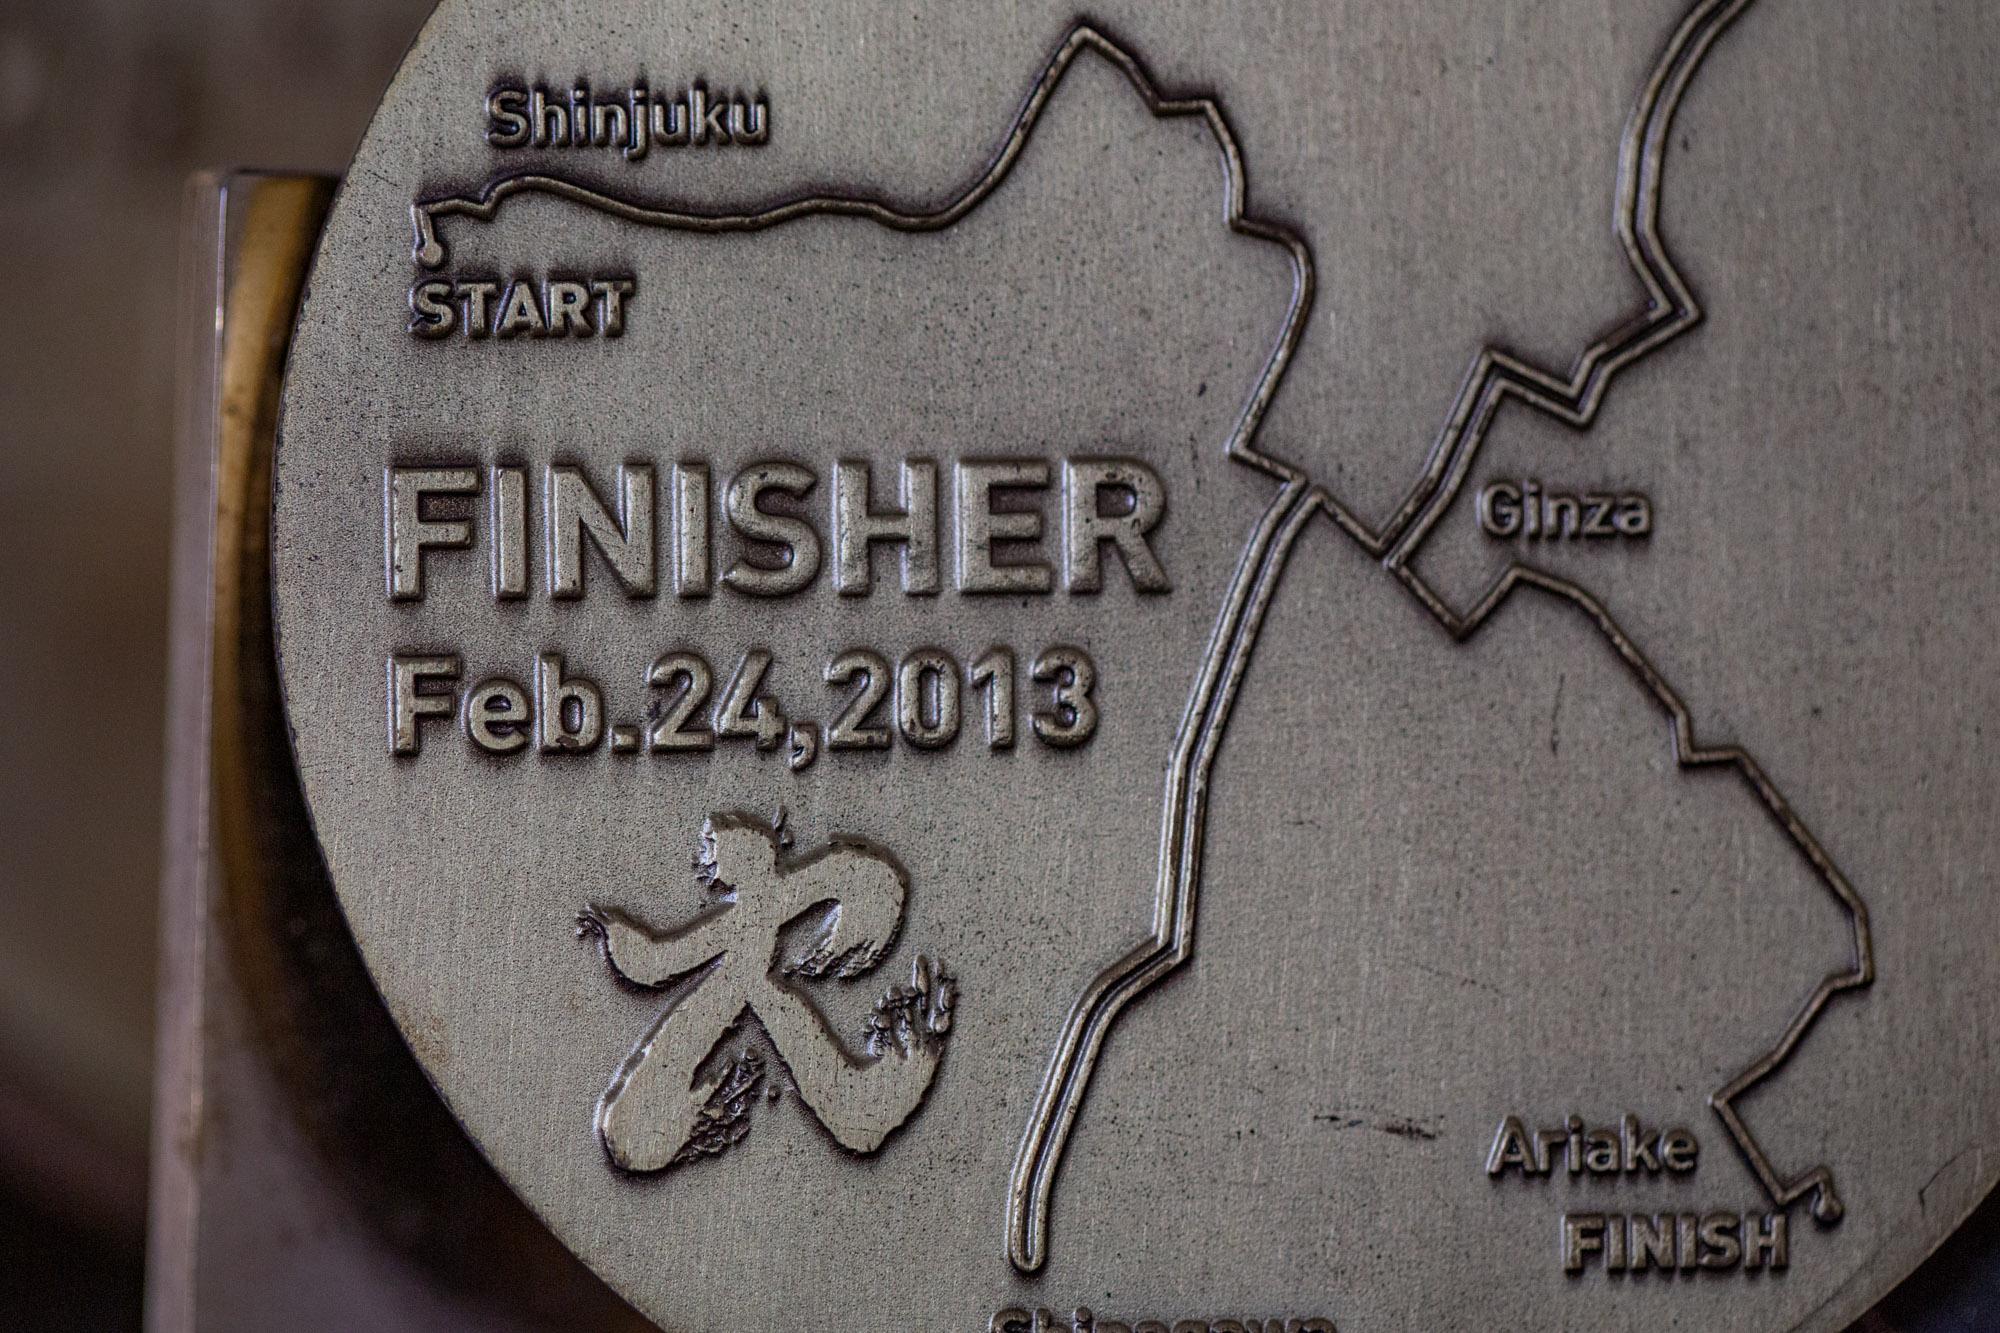 Marathon de Tokyo